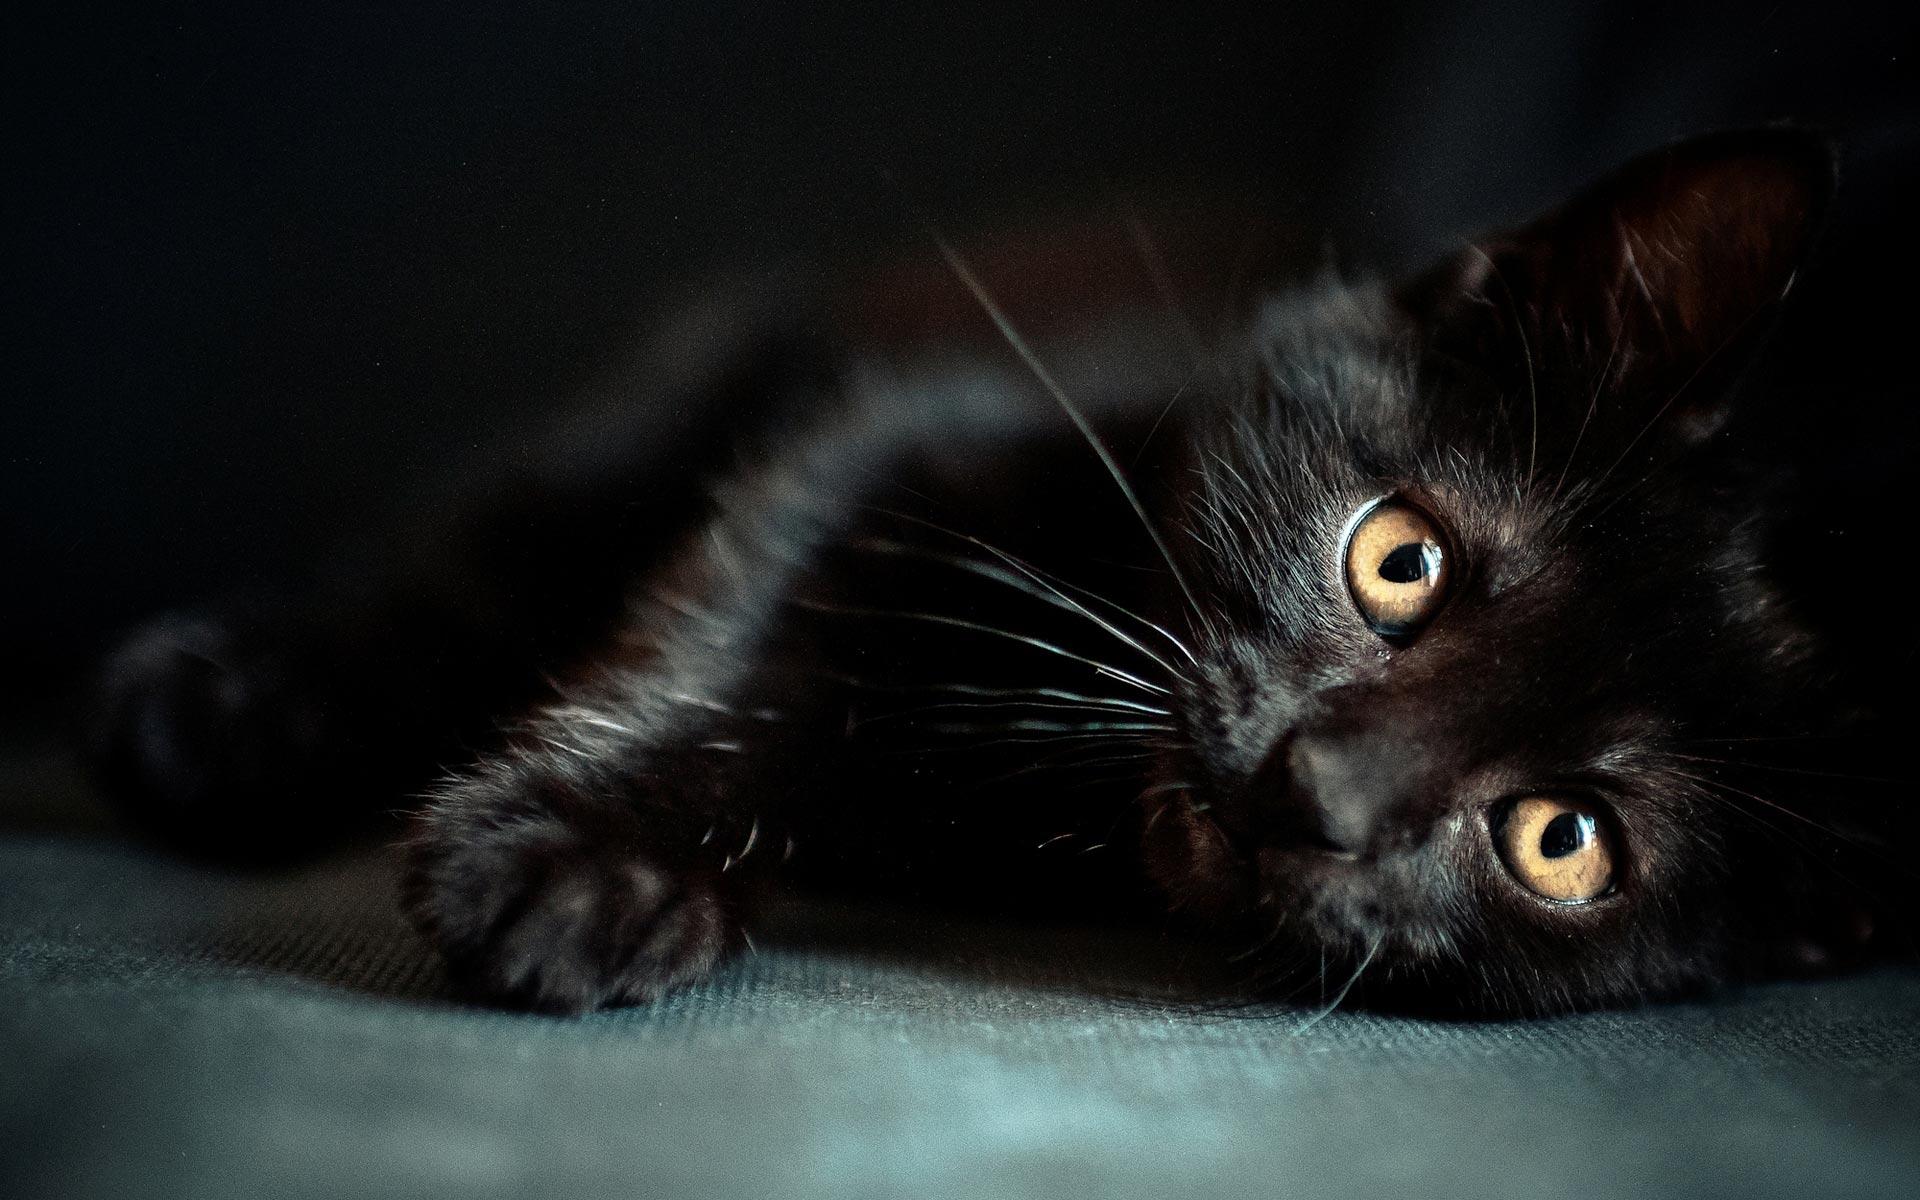 Wonderful Cat Wallpaper 1920x1200 - black-cats-24161-24823-hd-wallpapers  Image_1002953 .jpg